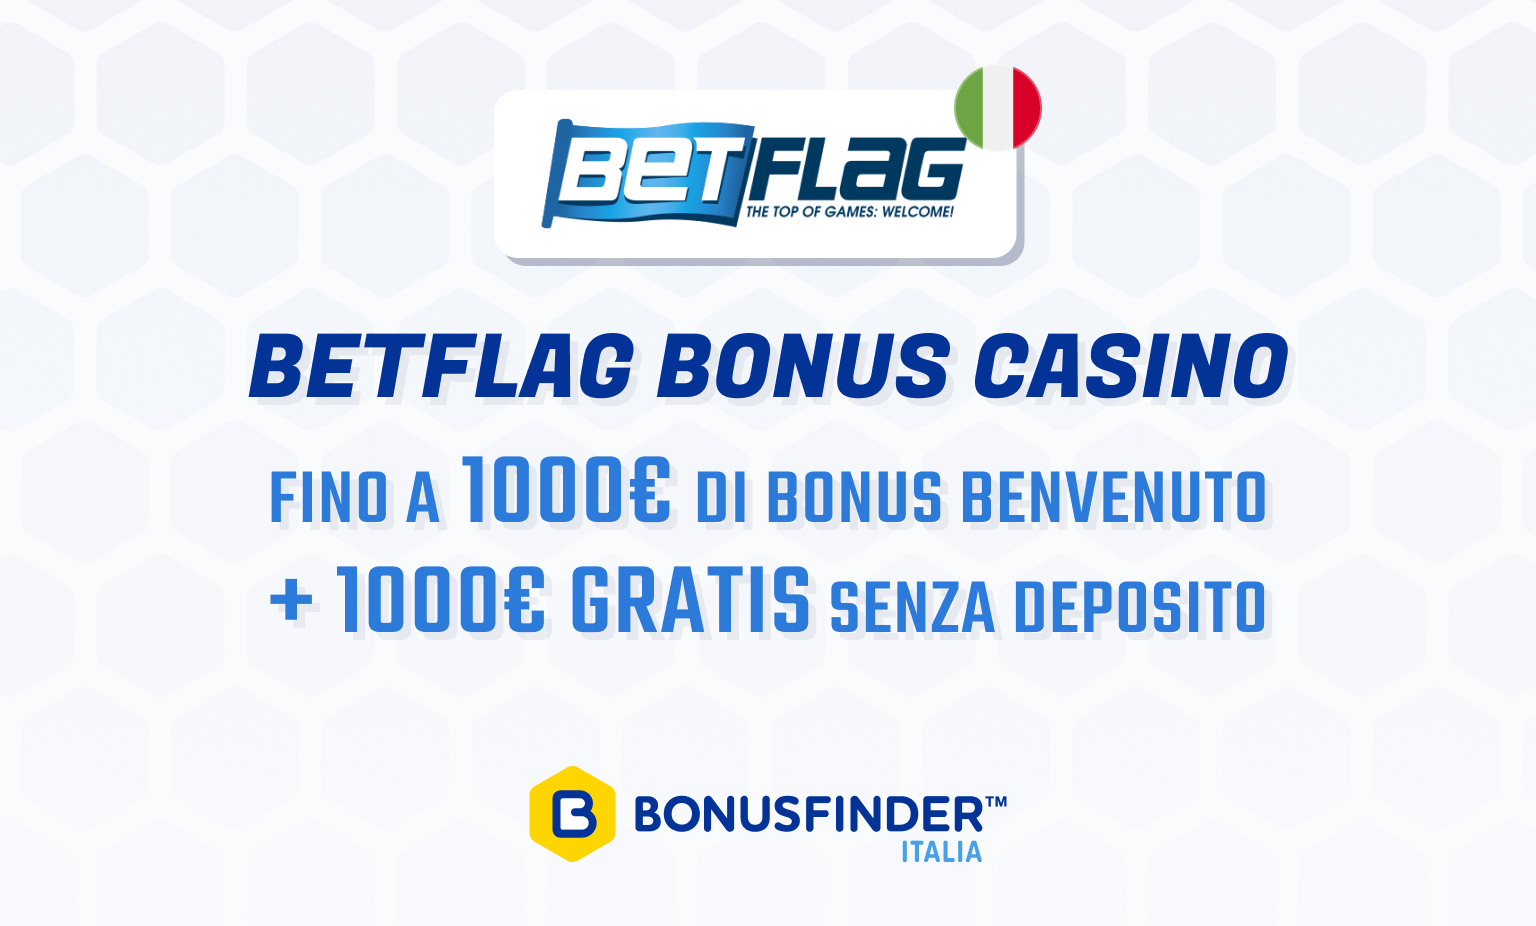 betflag bonus casino